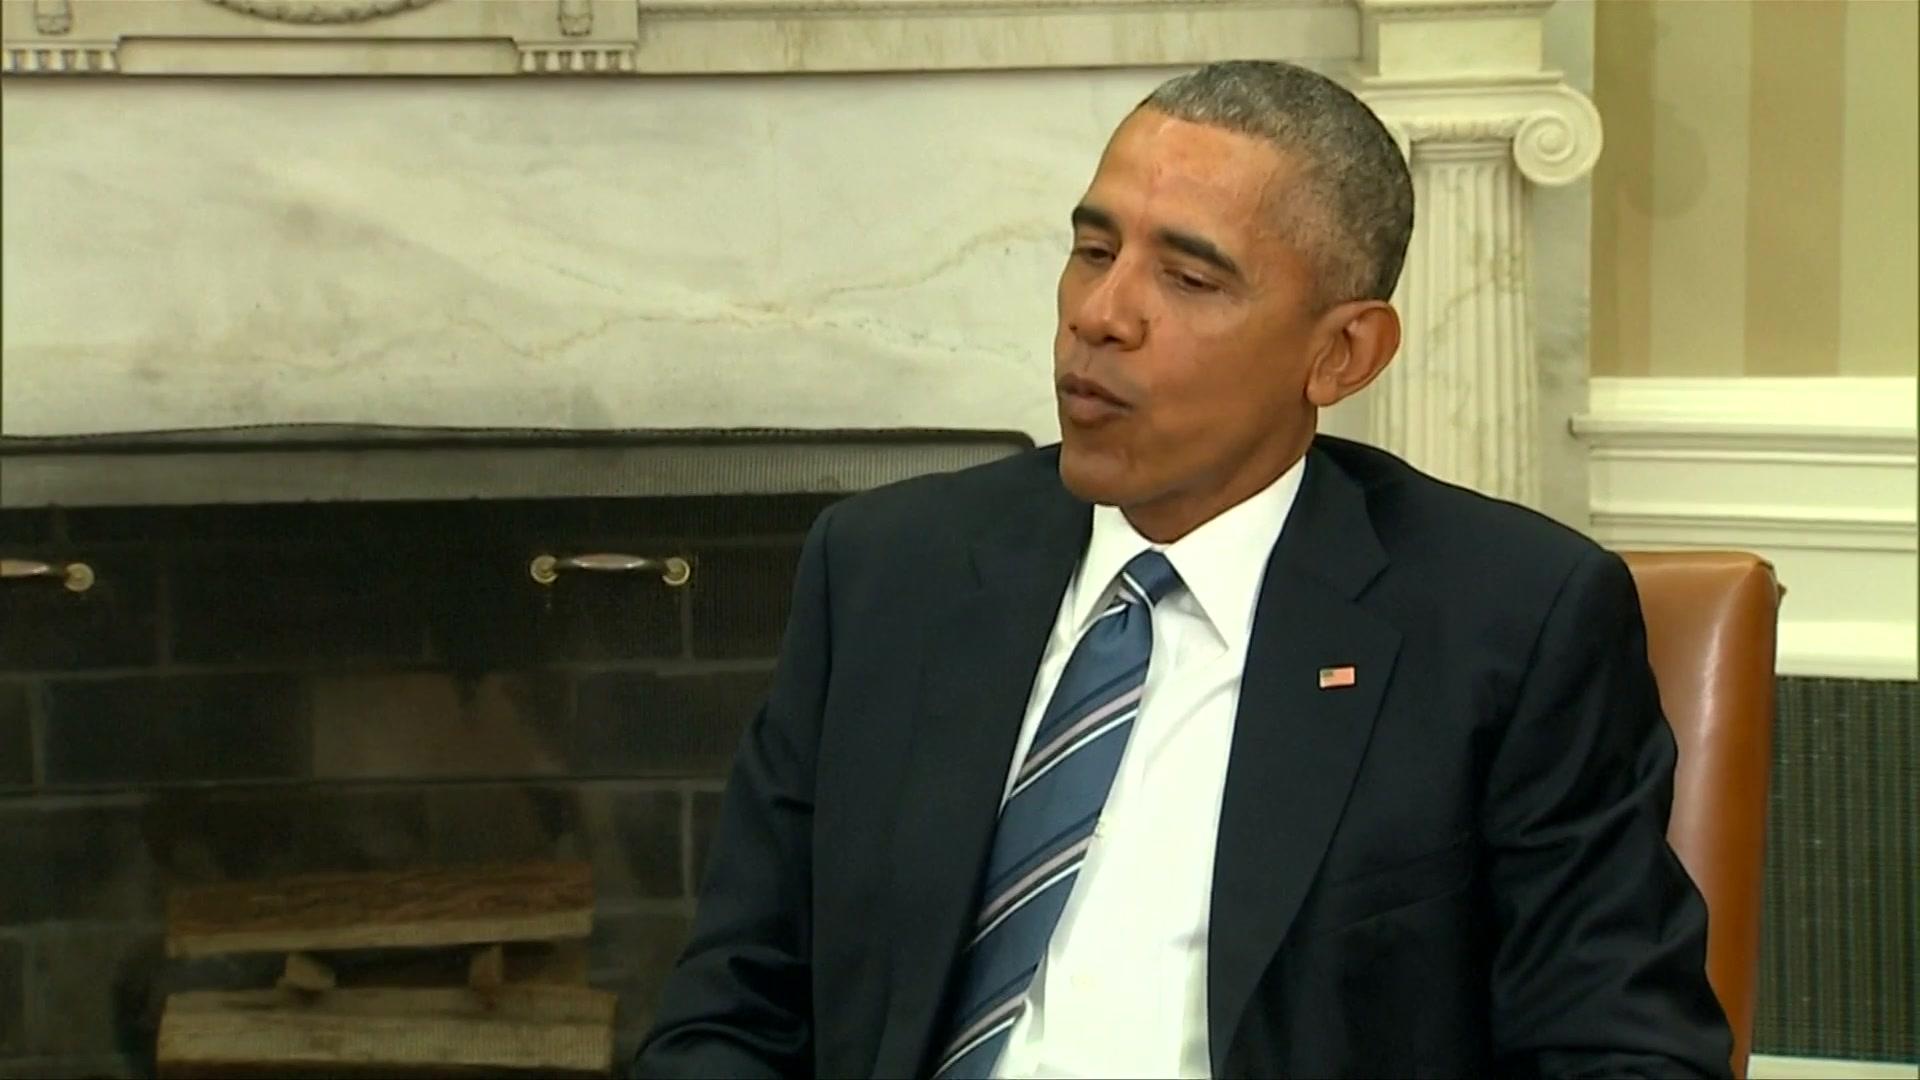 Obama: Republicans Risk Diminishing Credibility of Supreme Court